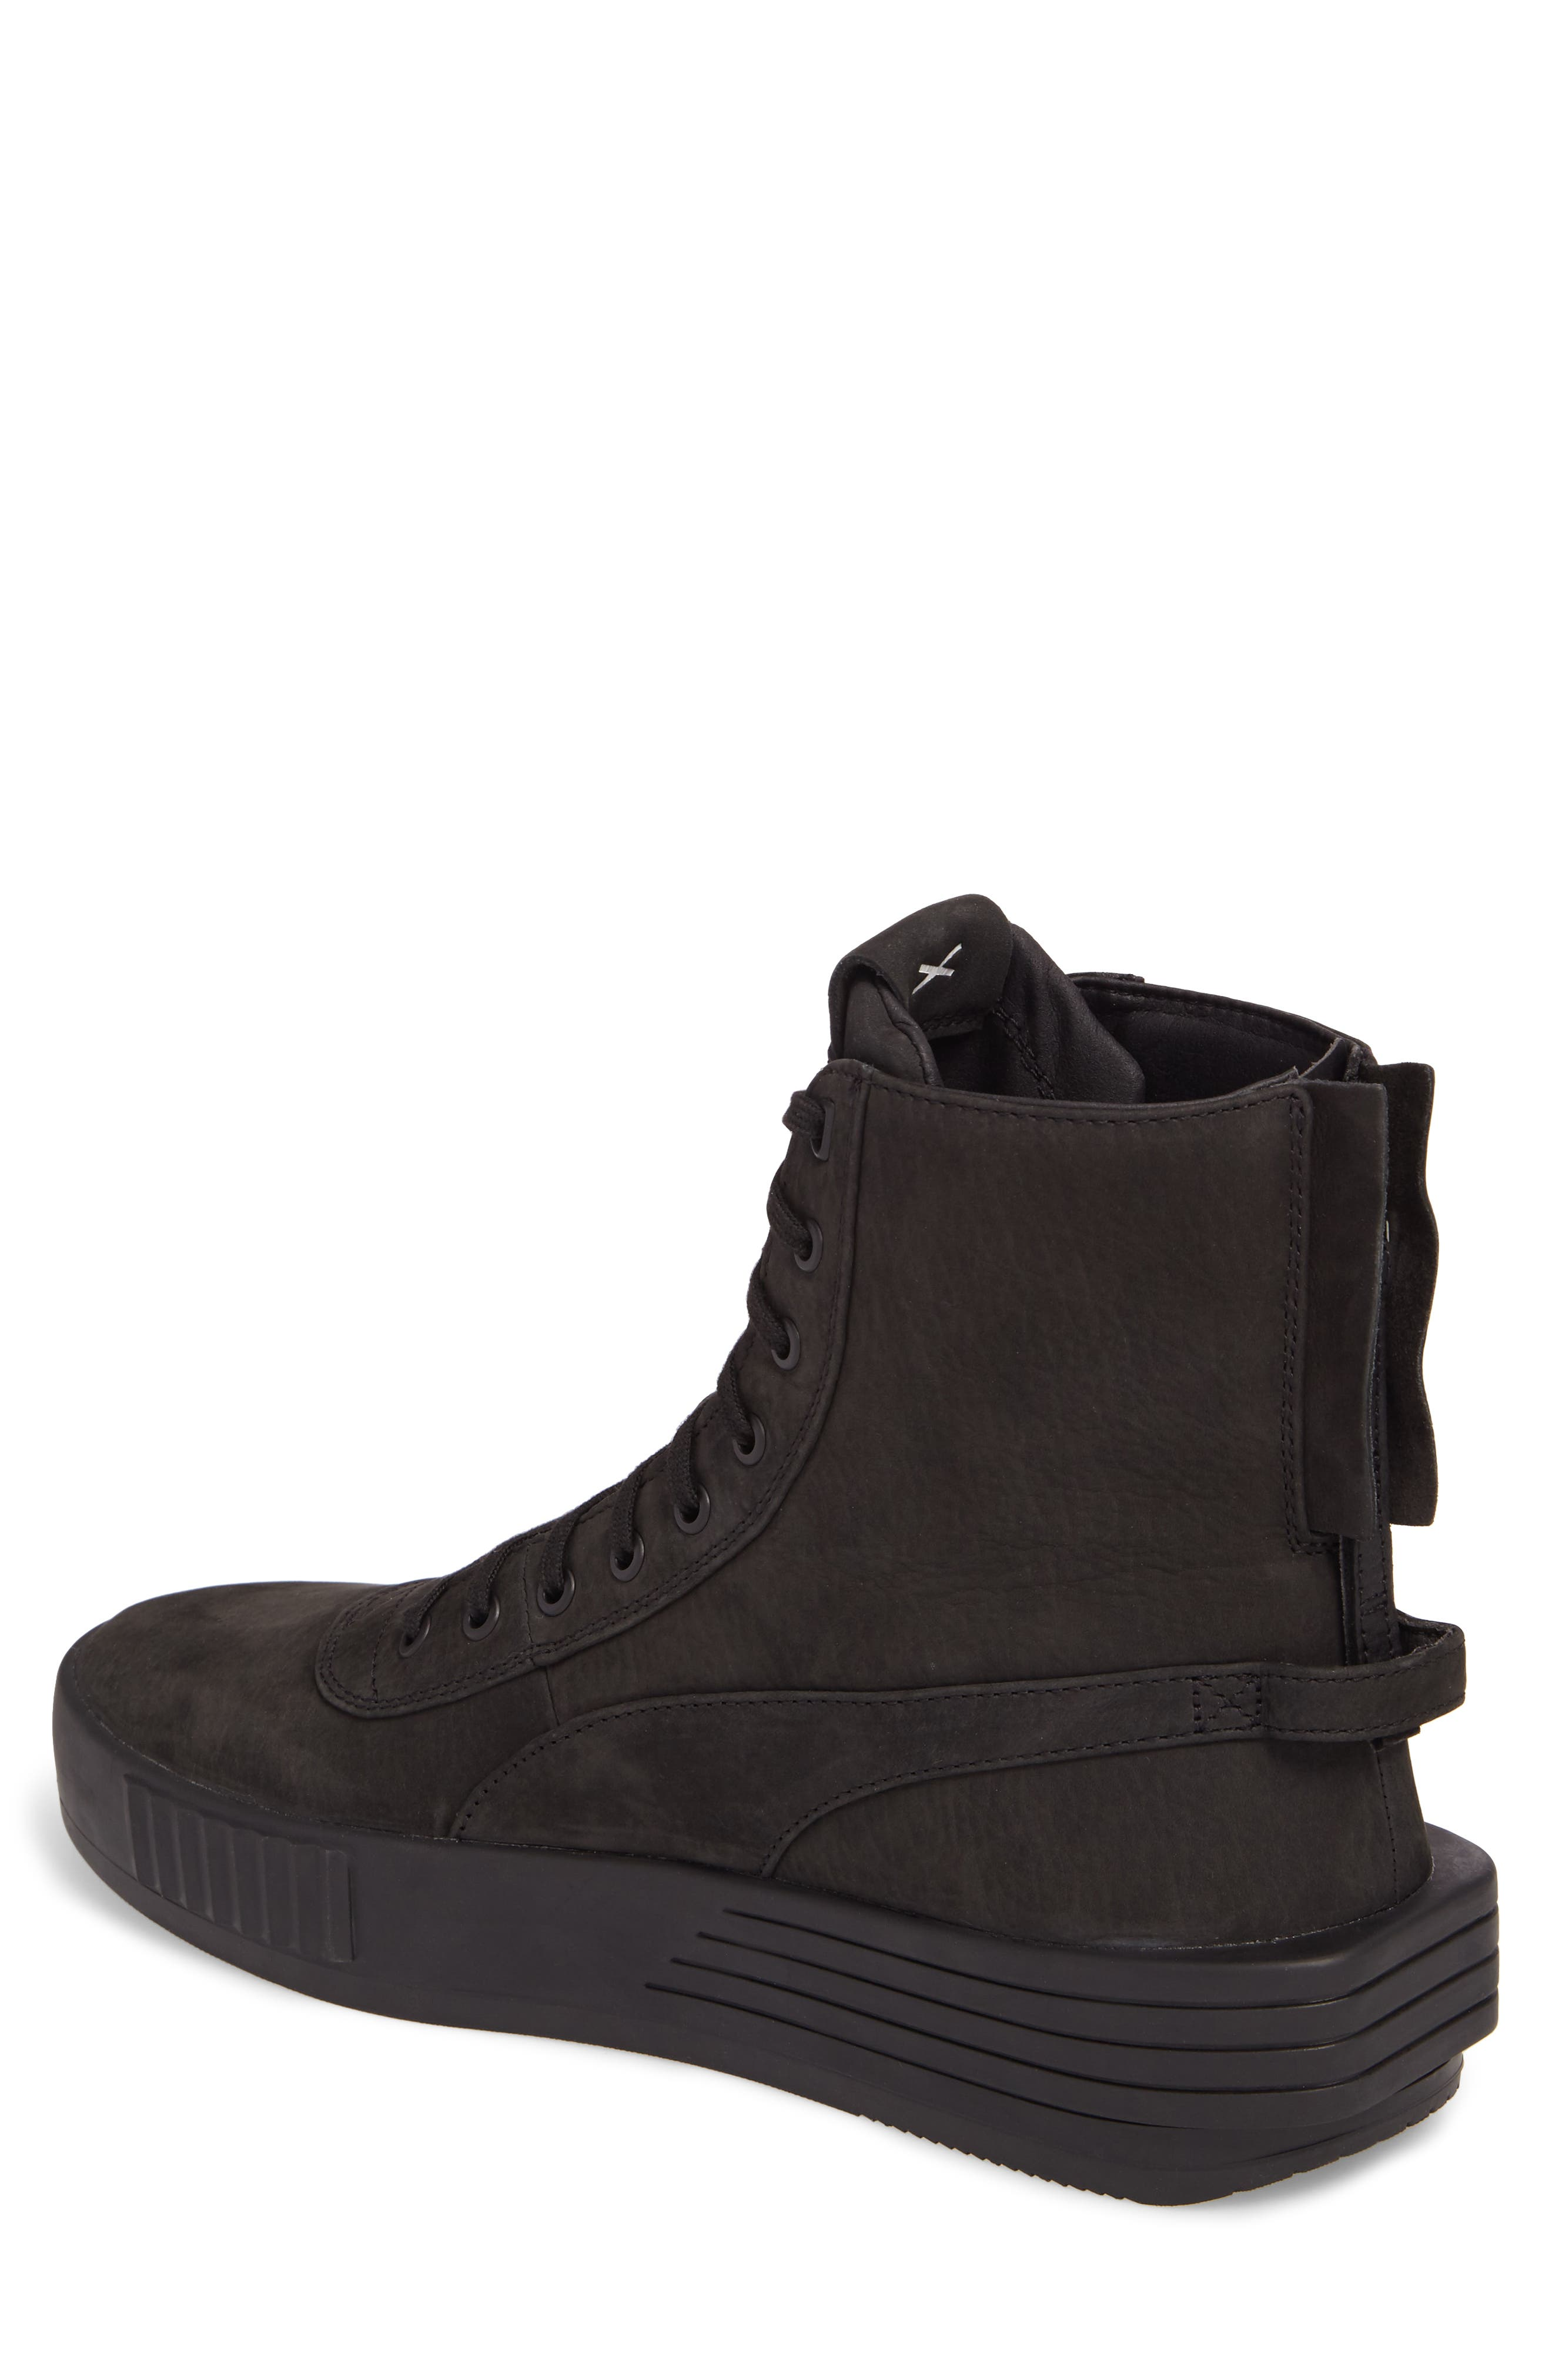 XO Parallel Weeknd Sneaker,                             Alternate thumbnail 2, color,                             001